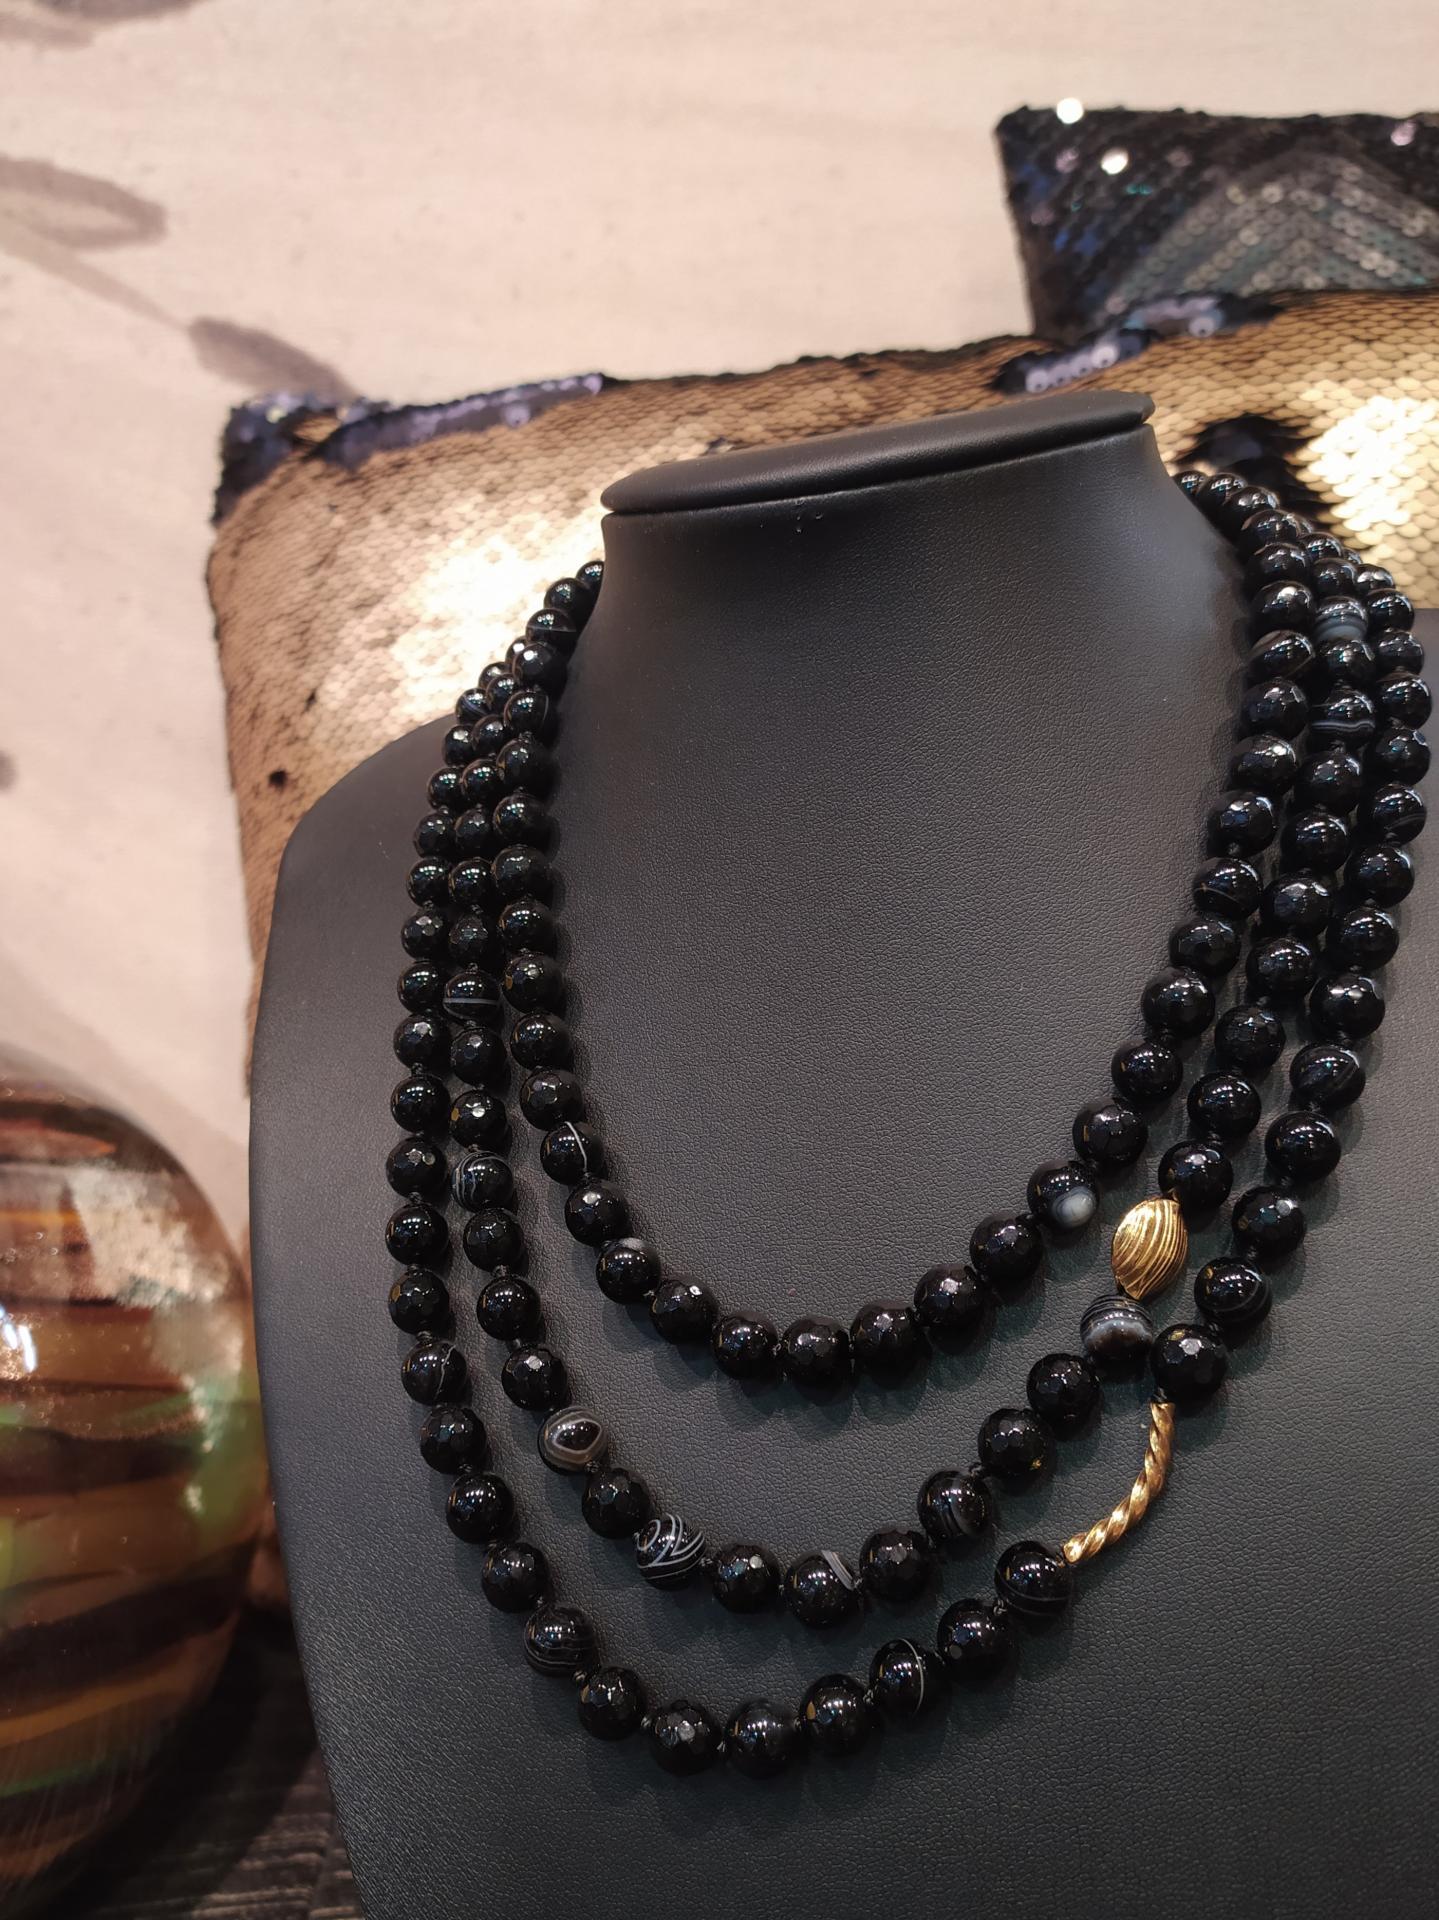 Collier multi rangs onyx jade ref 311 2 90 g prix 145 eur entre 40 a 50 cm